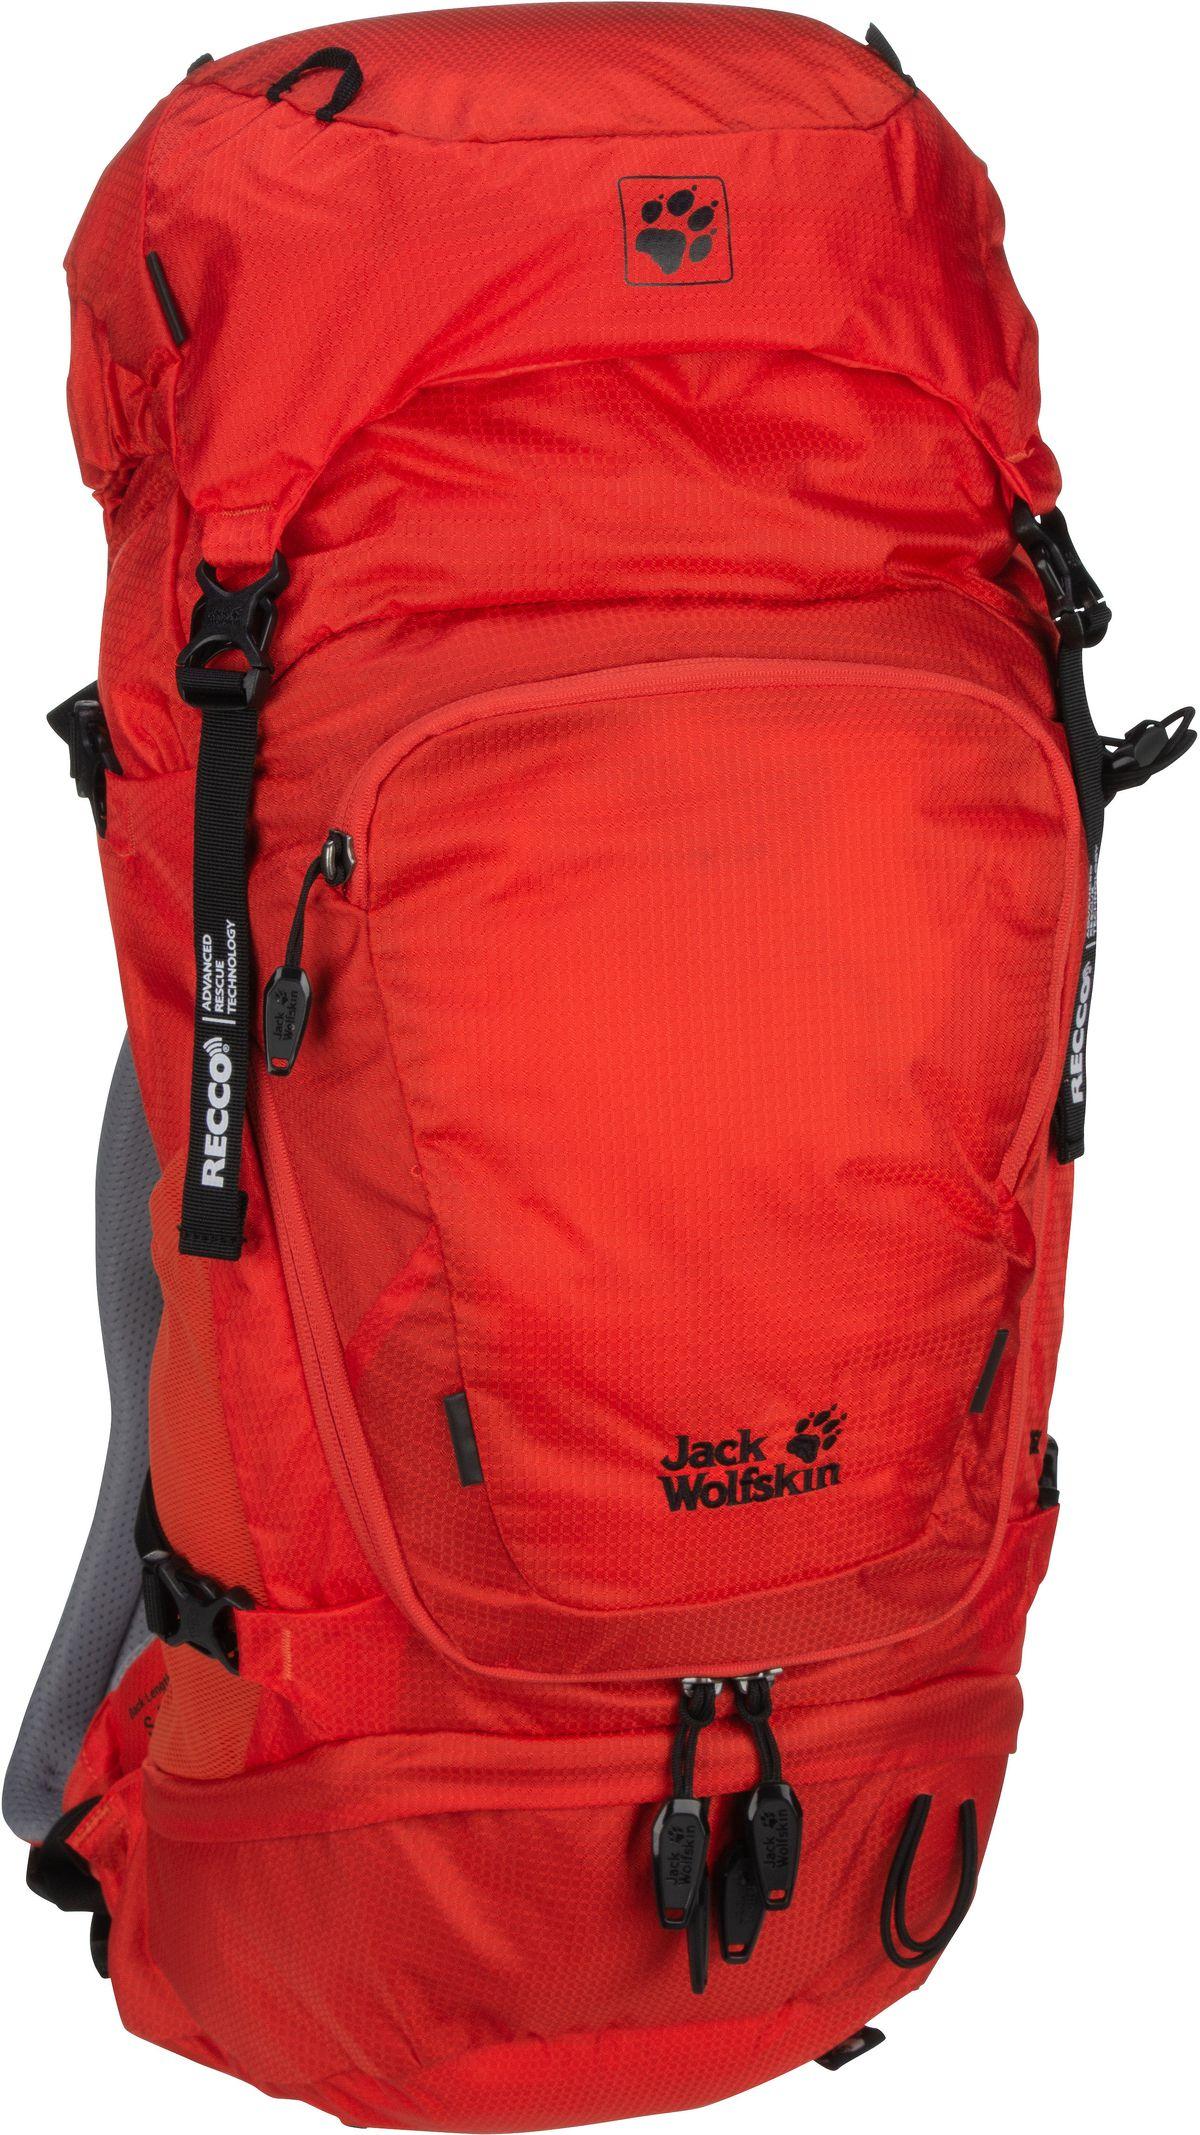 Wanderrucksack Orbit 26 Pack Recco S-M Lava Red (26 Liter)